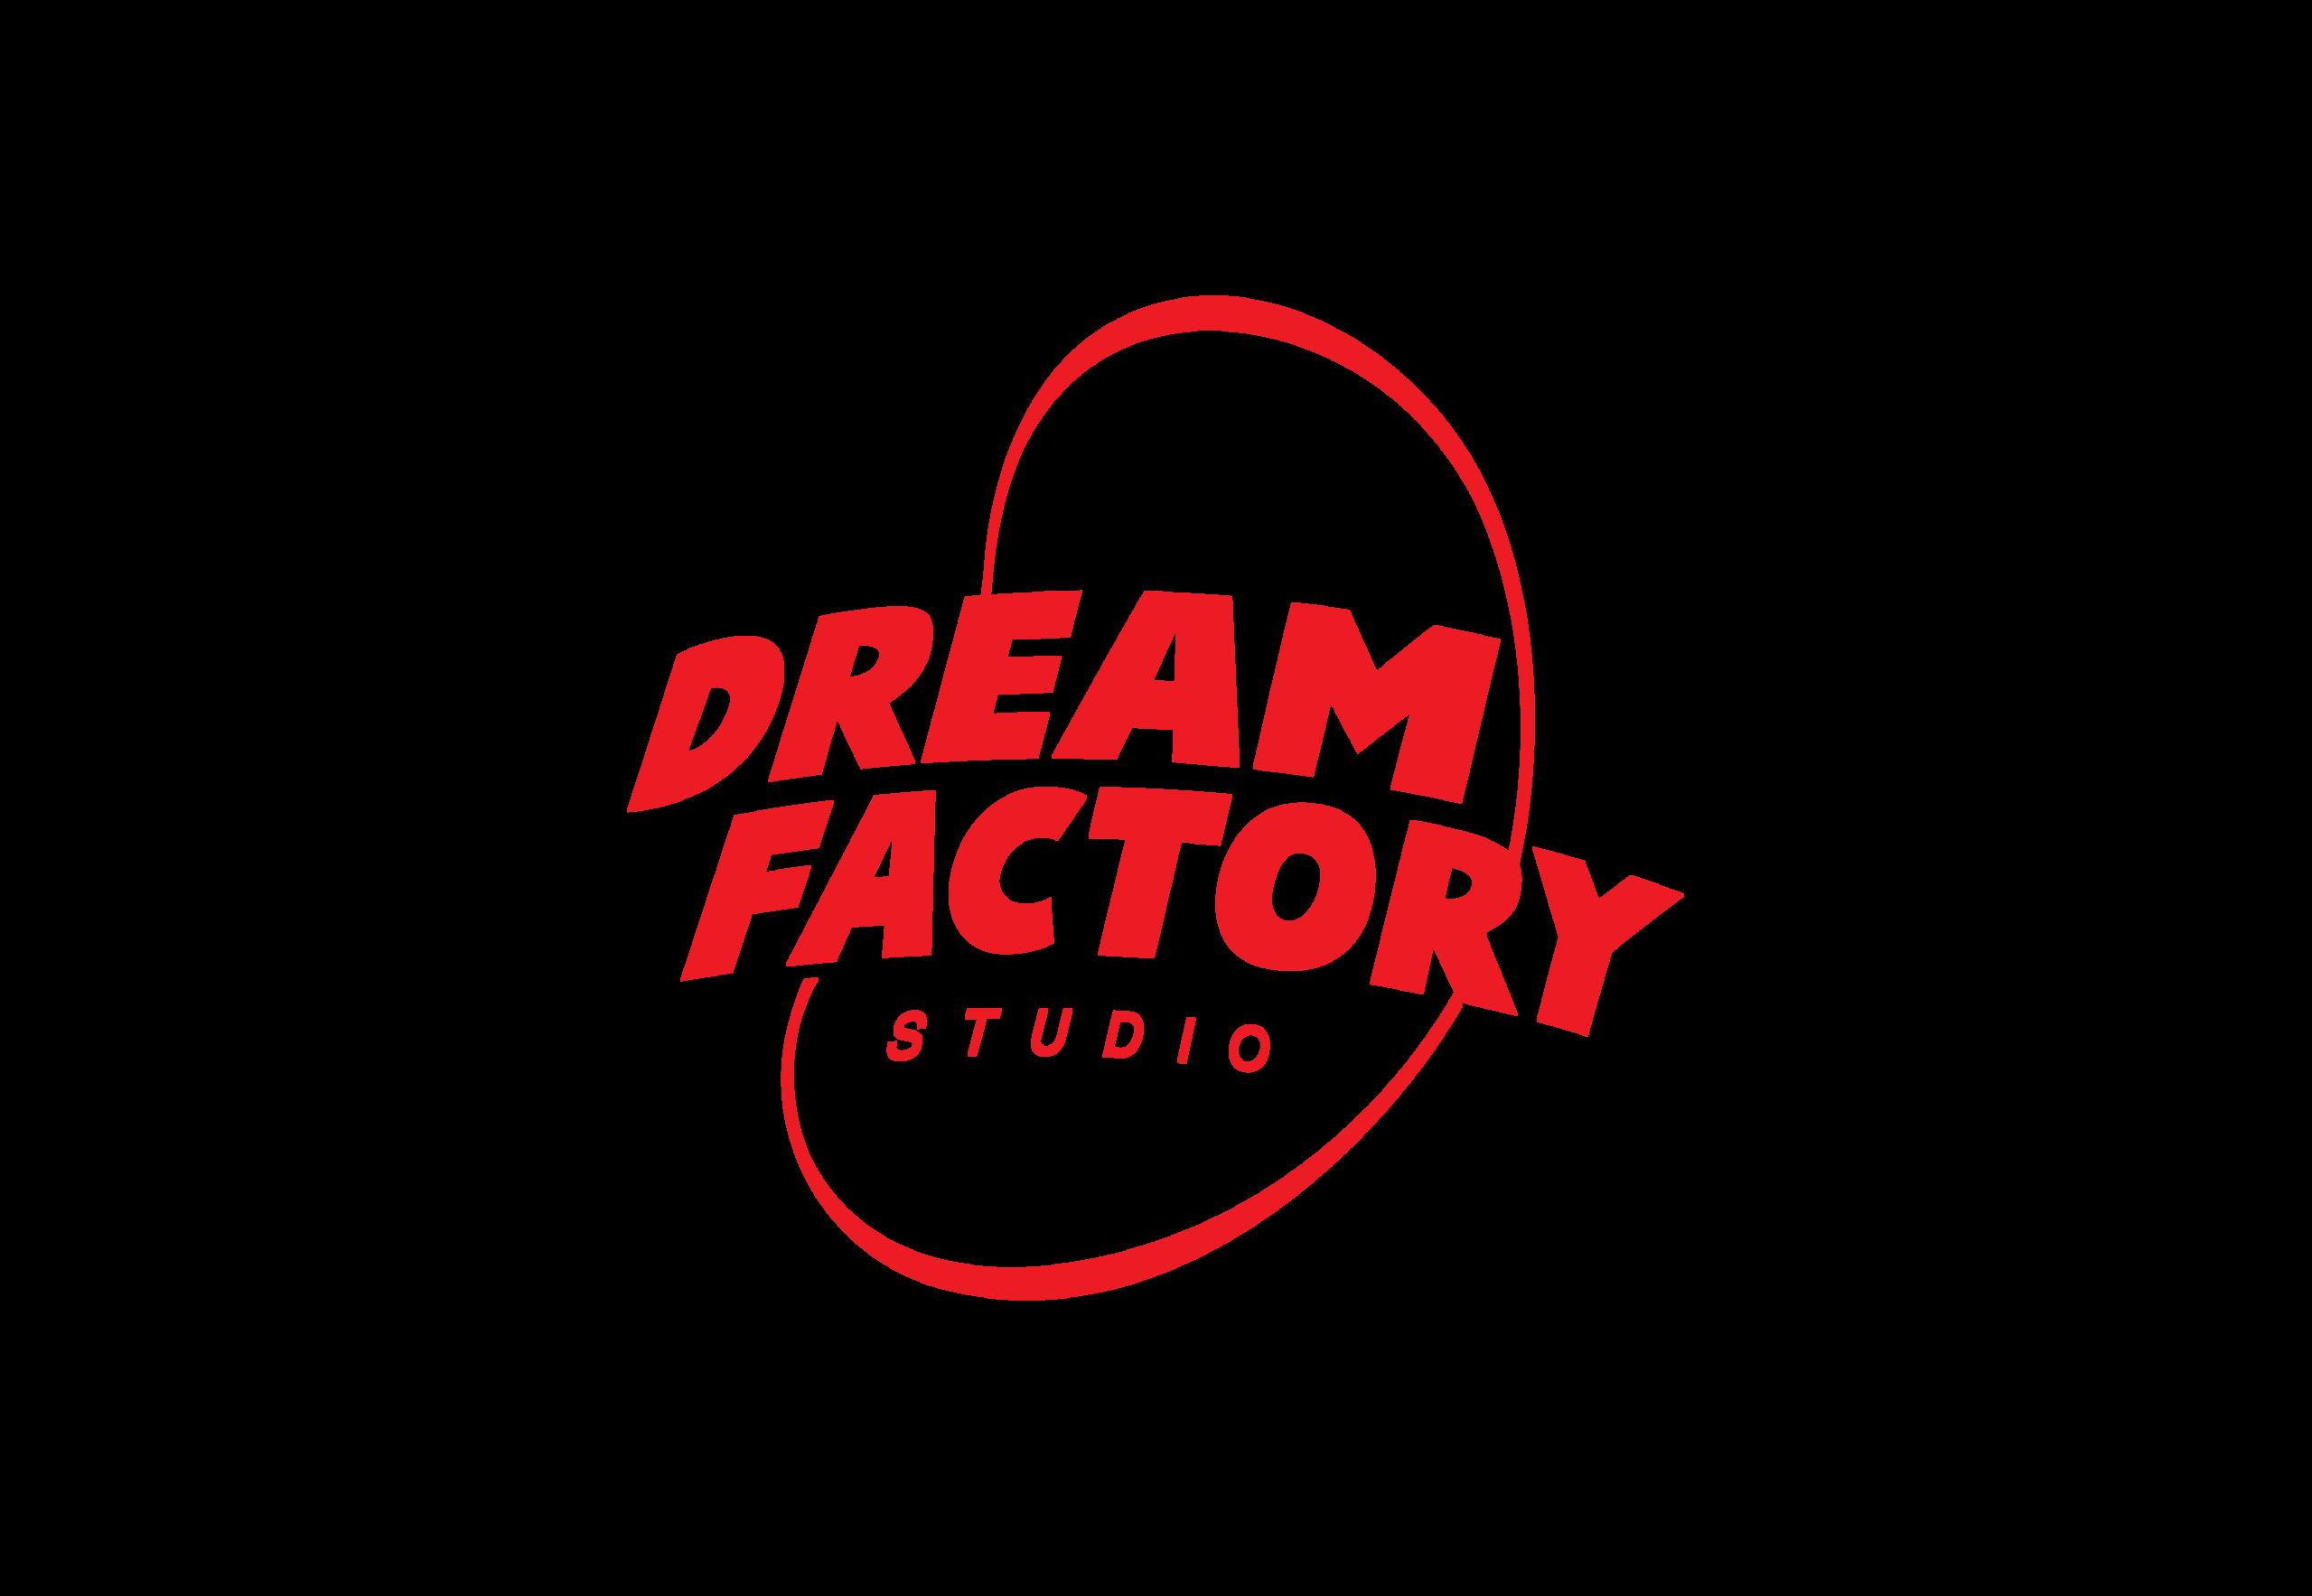 DREAMFACTORY STUDIO CI_RED.png